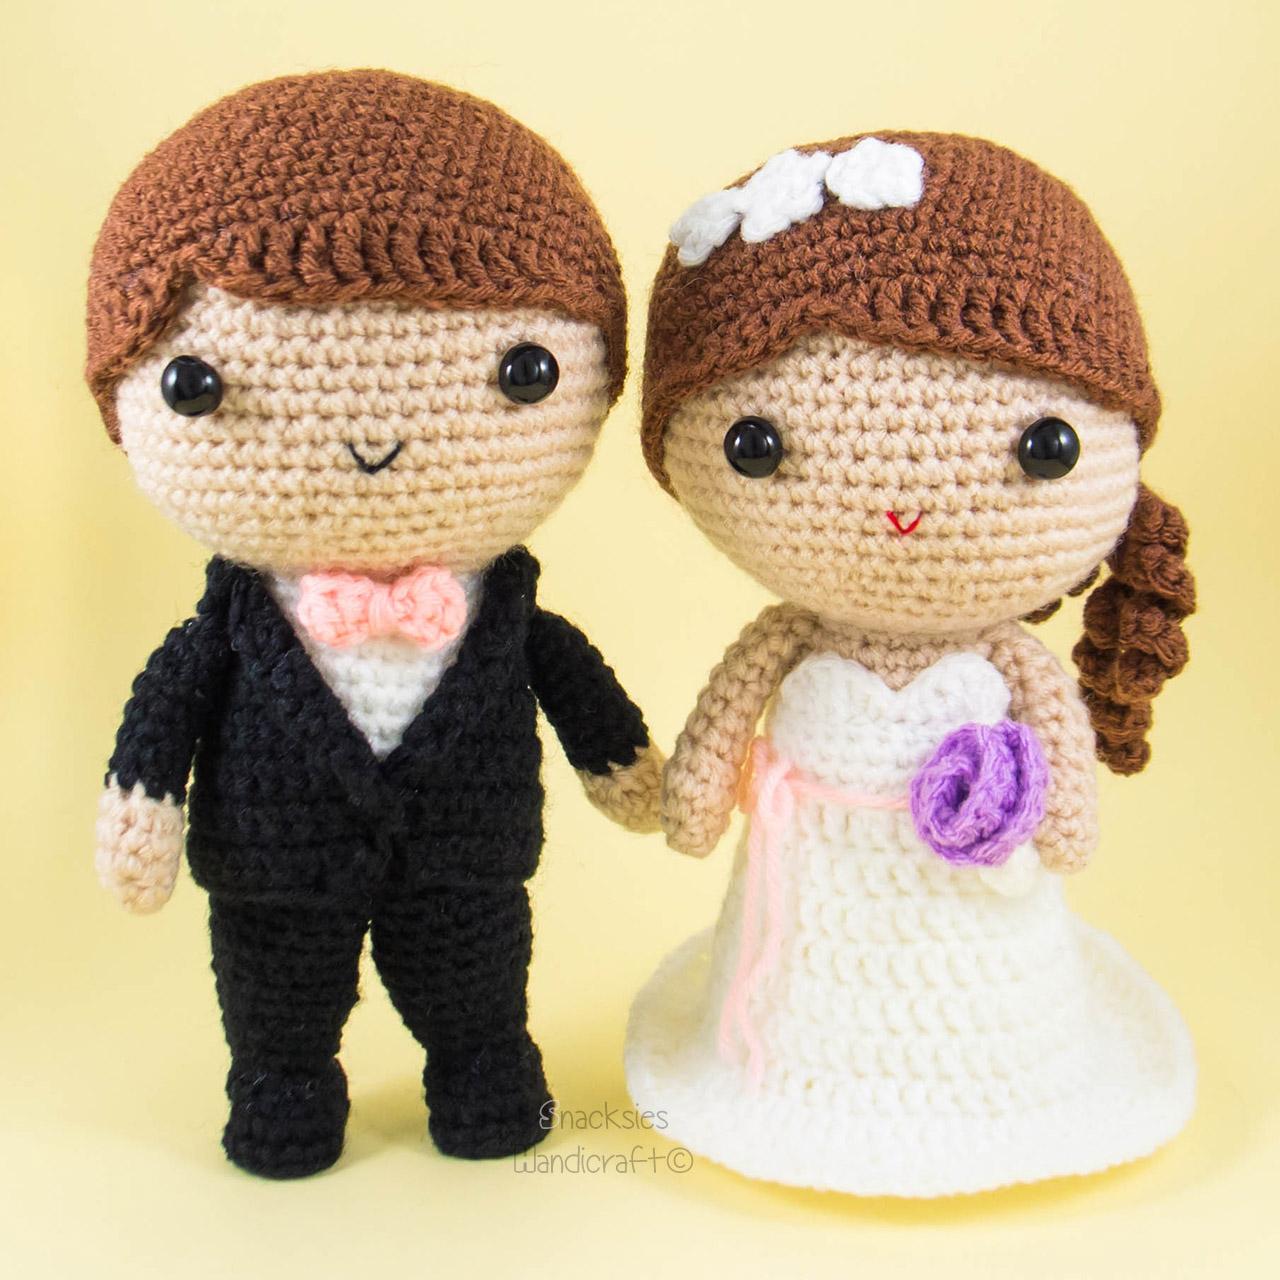 Crochet Wedding Gift Patterns: Bride And Groom Amigurumi Crochet